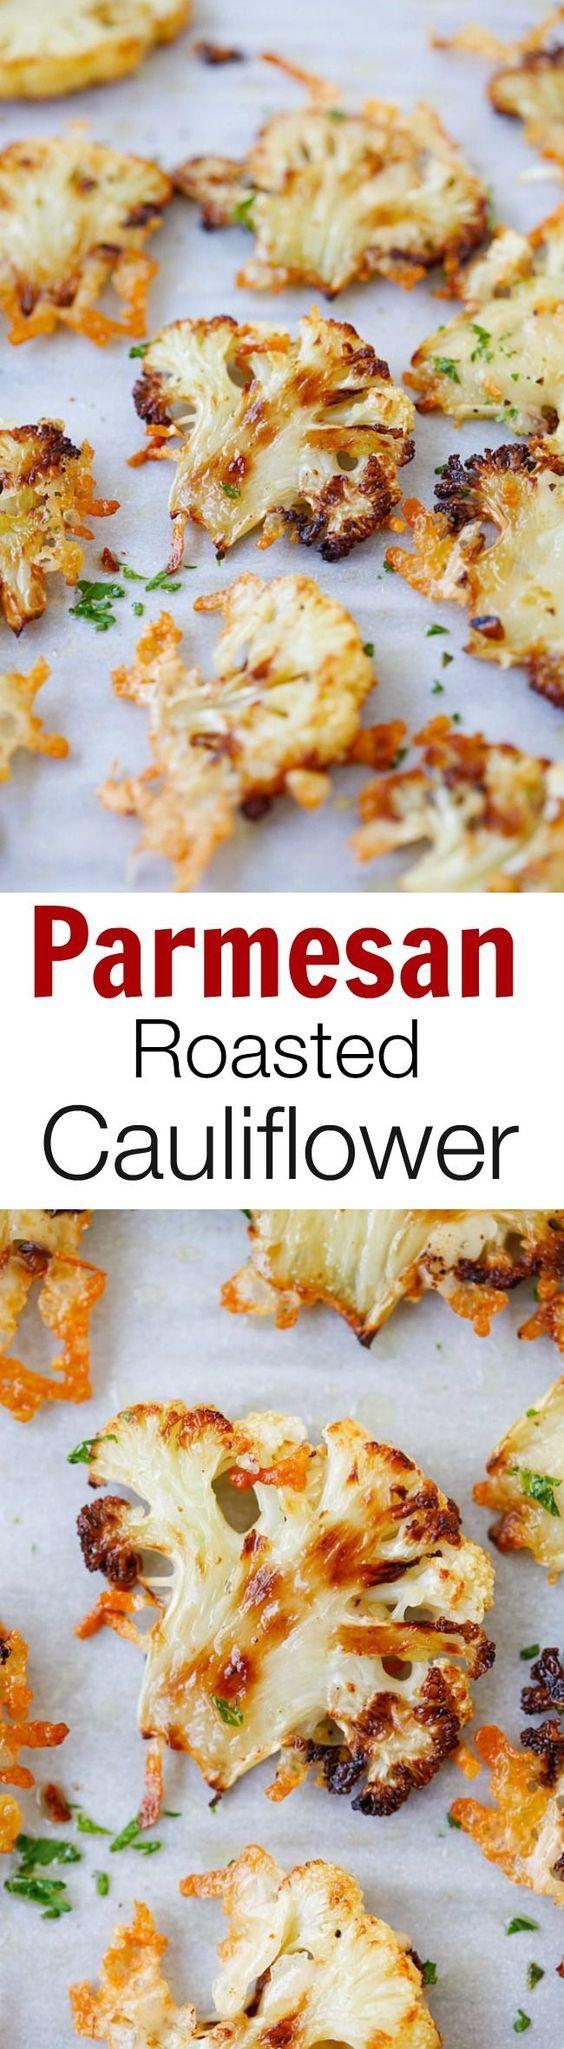 Parmesan roasted cauliflower - easiest and best roasted vegetable ever. Slice…